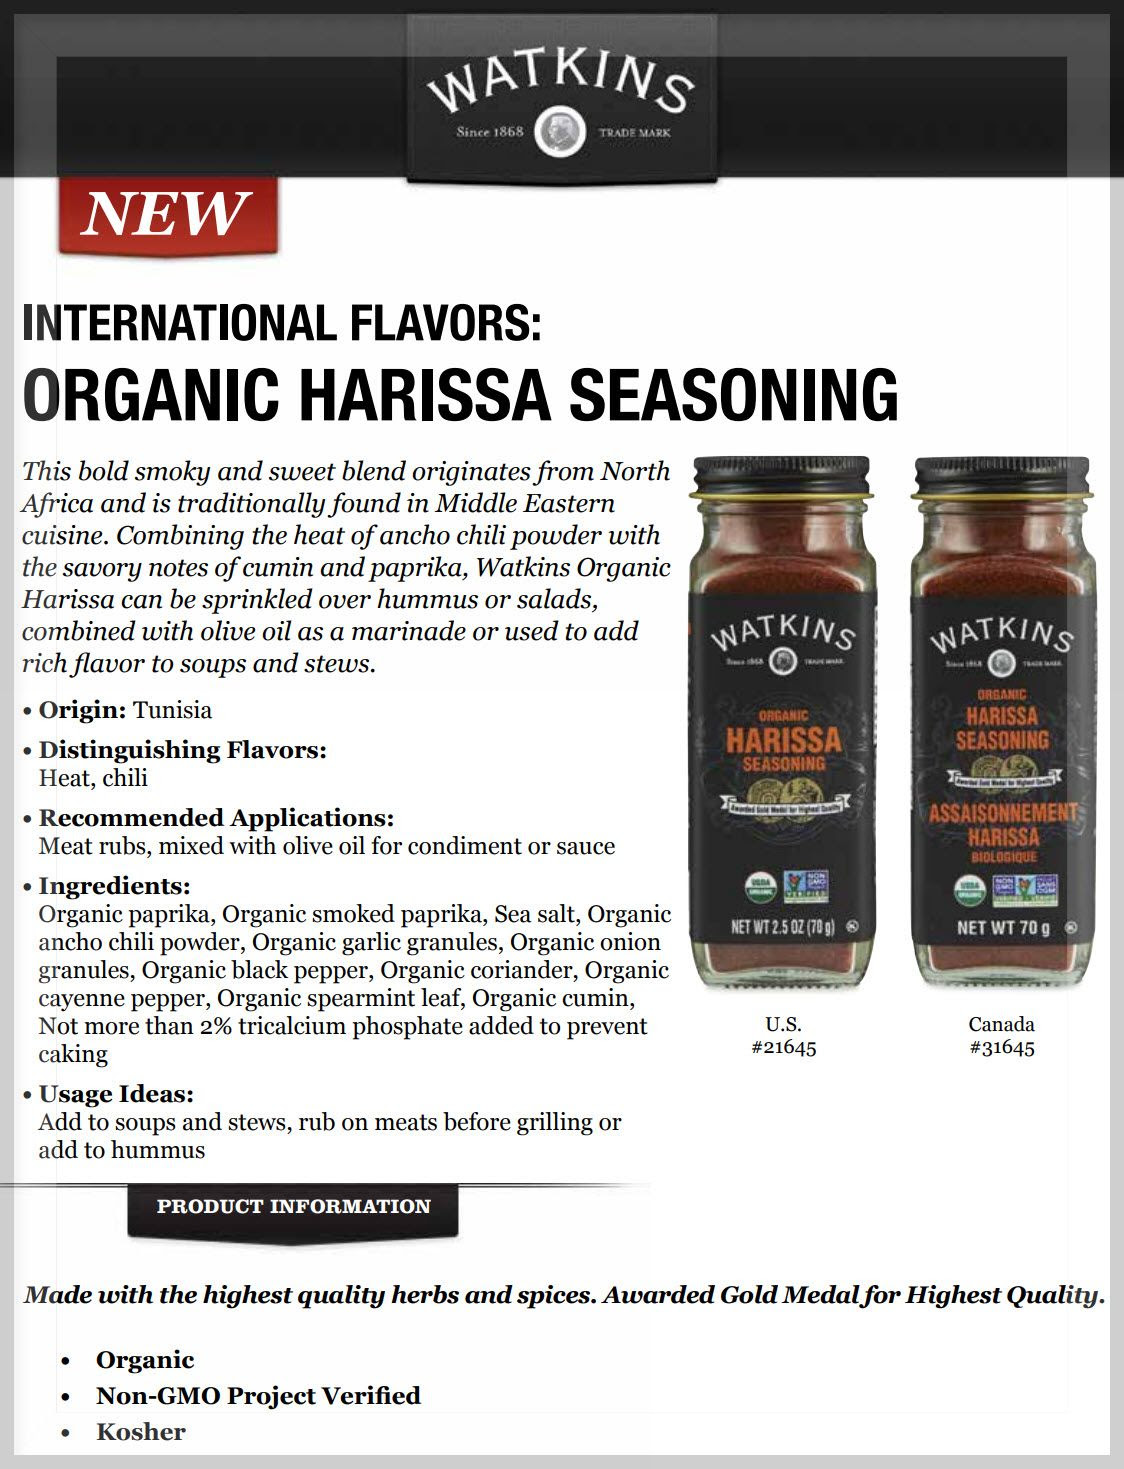 Watkins Organic Harissa Seasoning